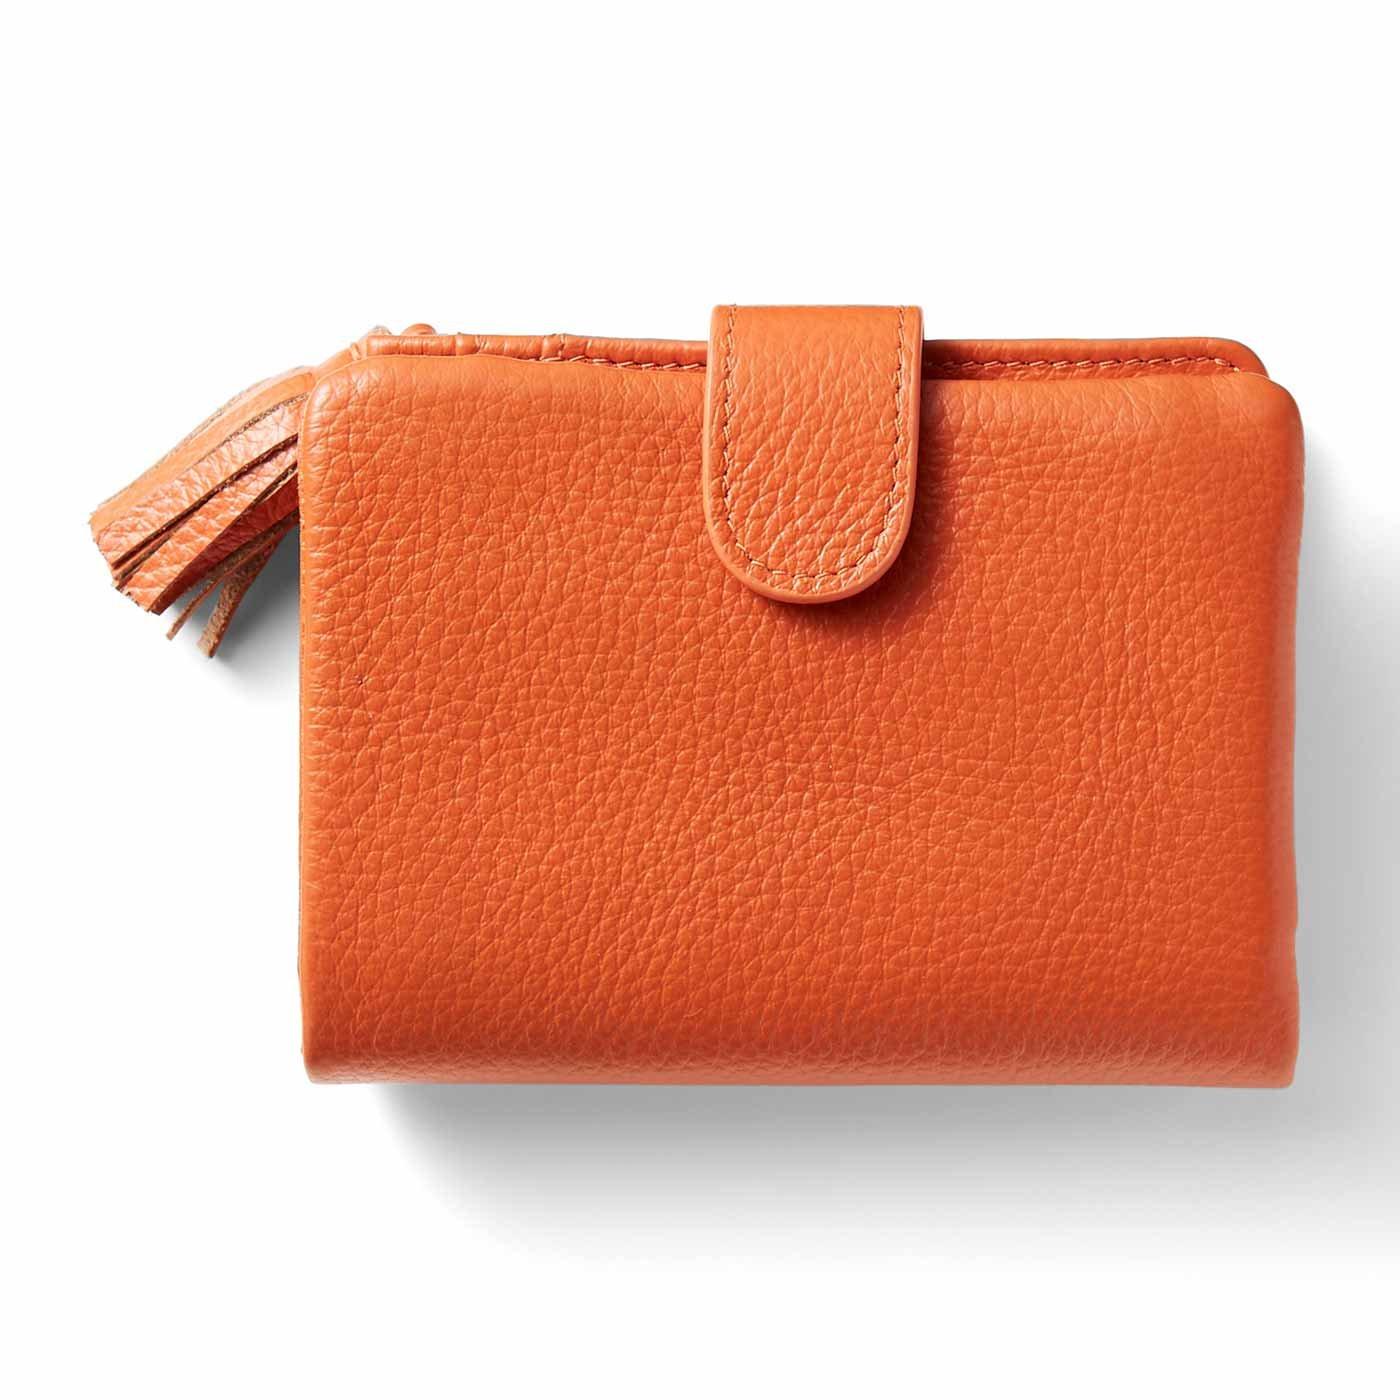 IEDIT[イディット] くったり本革素材できれいめ二つ折り財布〈オレンジ〉